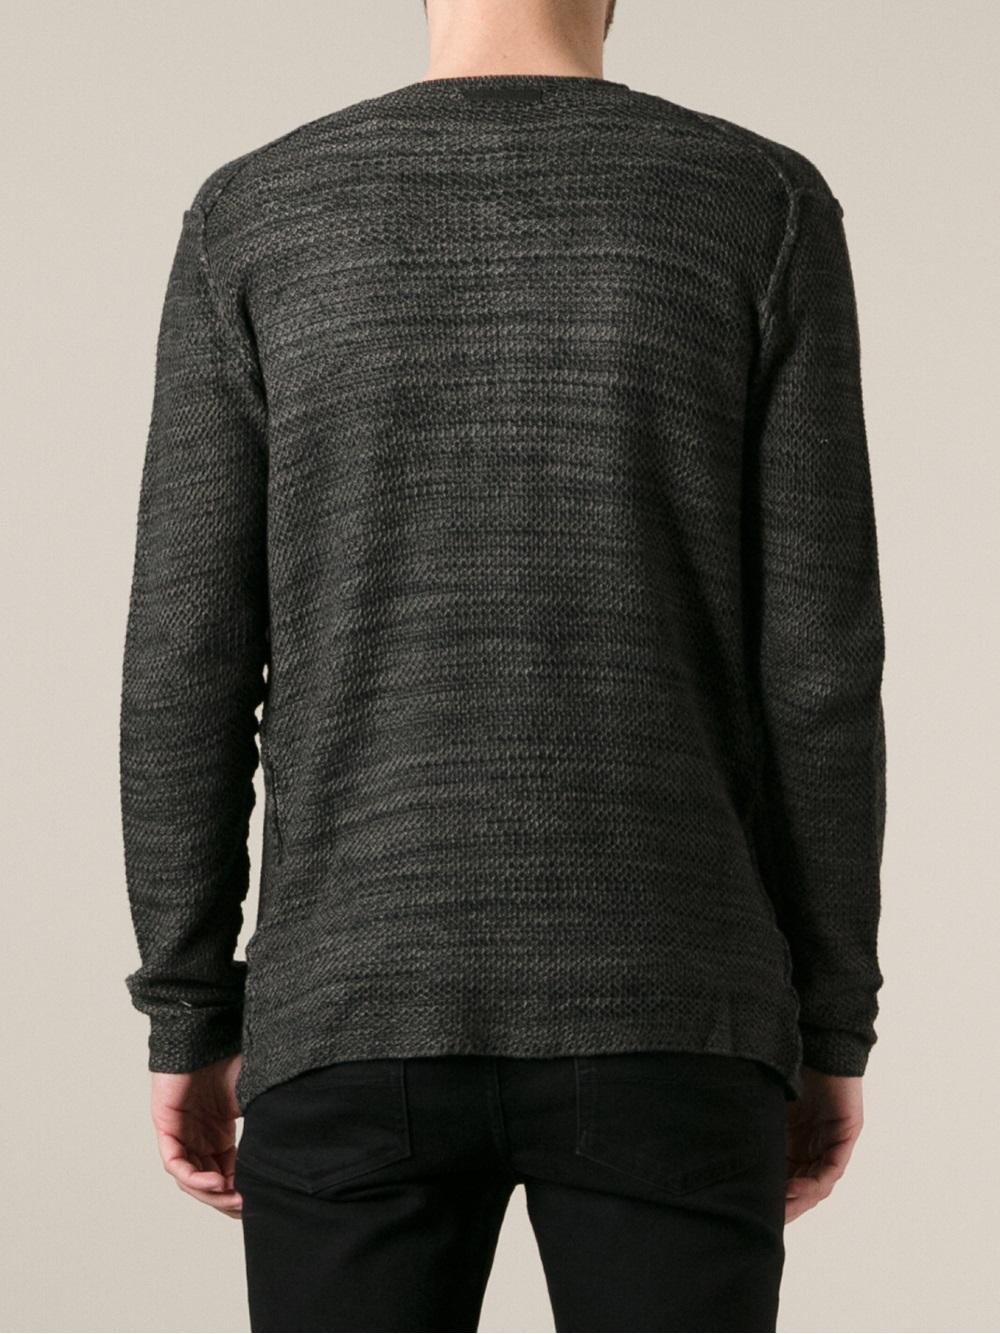 Diesel black gold Kirufi Tricot Cardigan in Gray for Men | Lyst